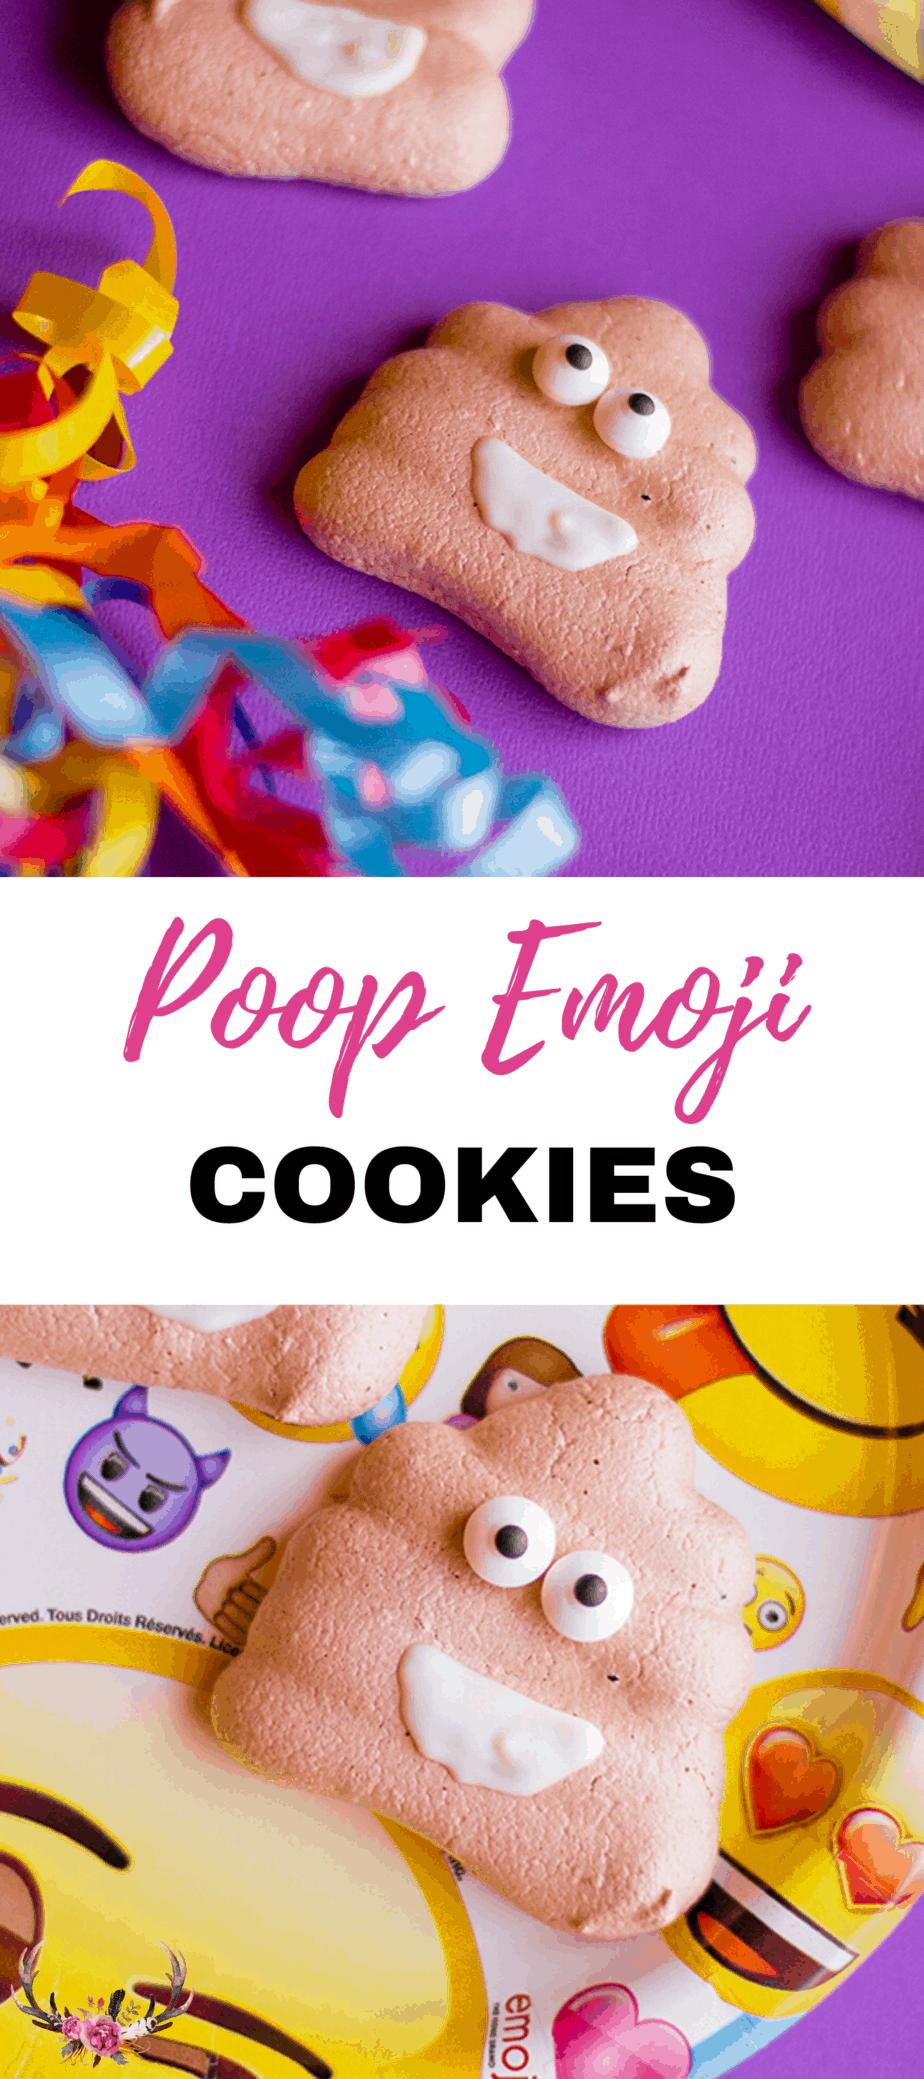 Poop emoji cookies are so cute and very easy to make.